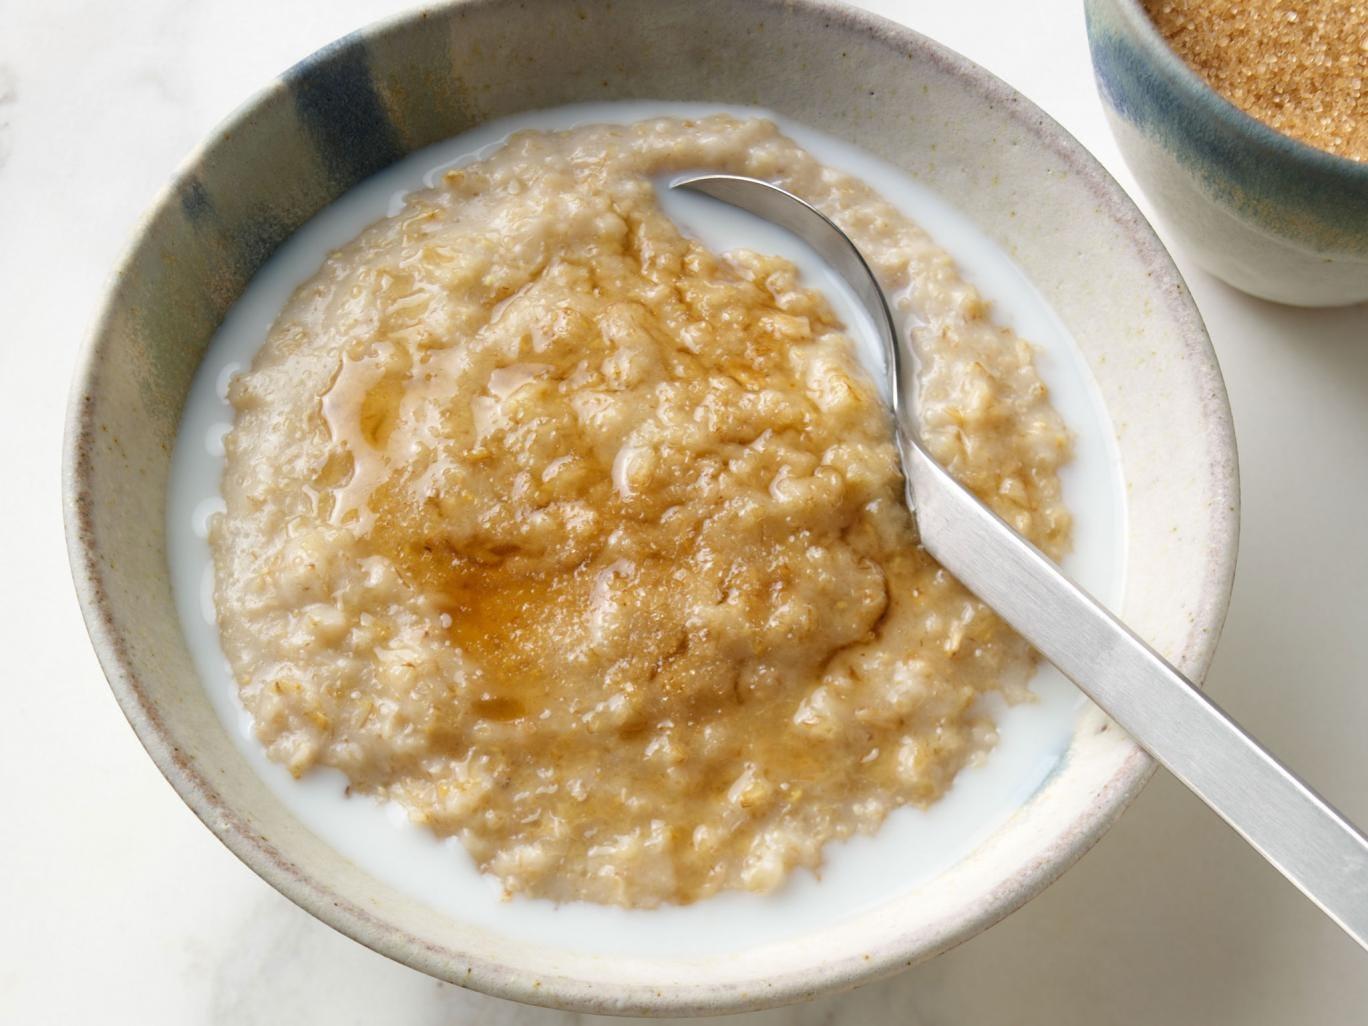 Morning glory: traditional porridge